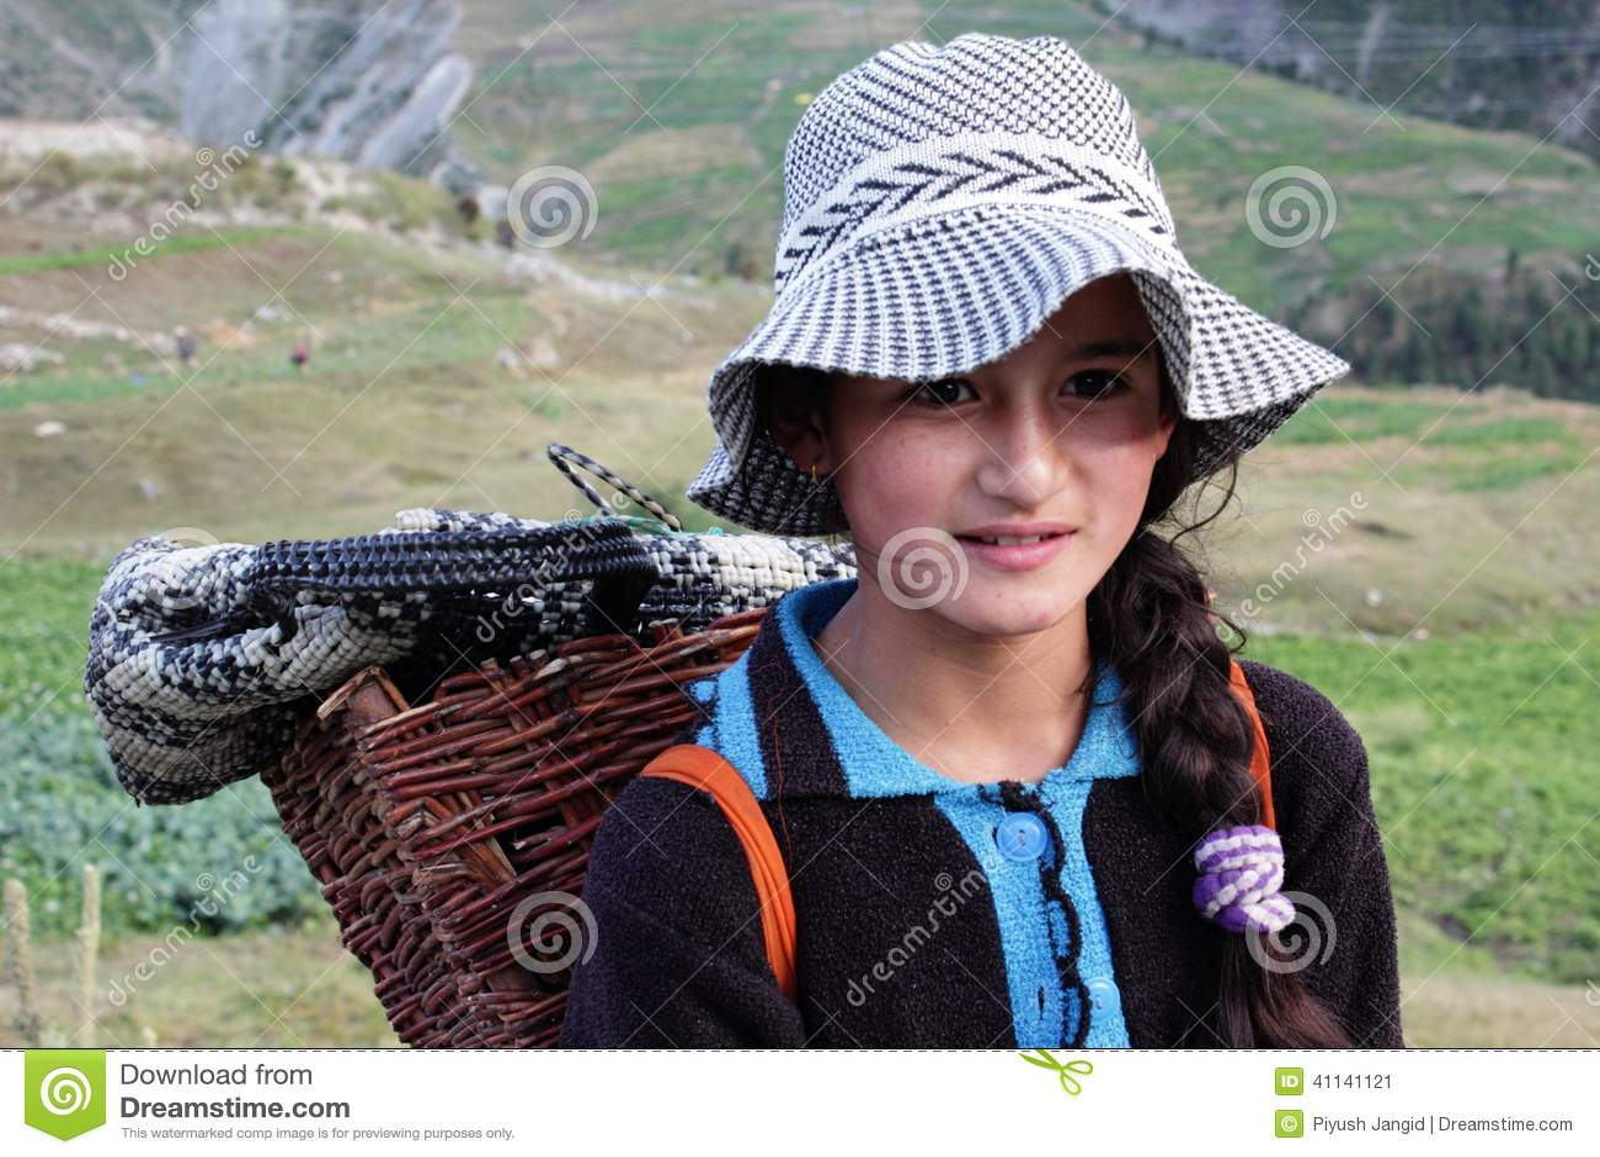 Himachal girls images 45